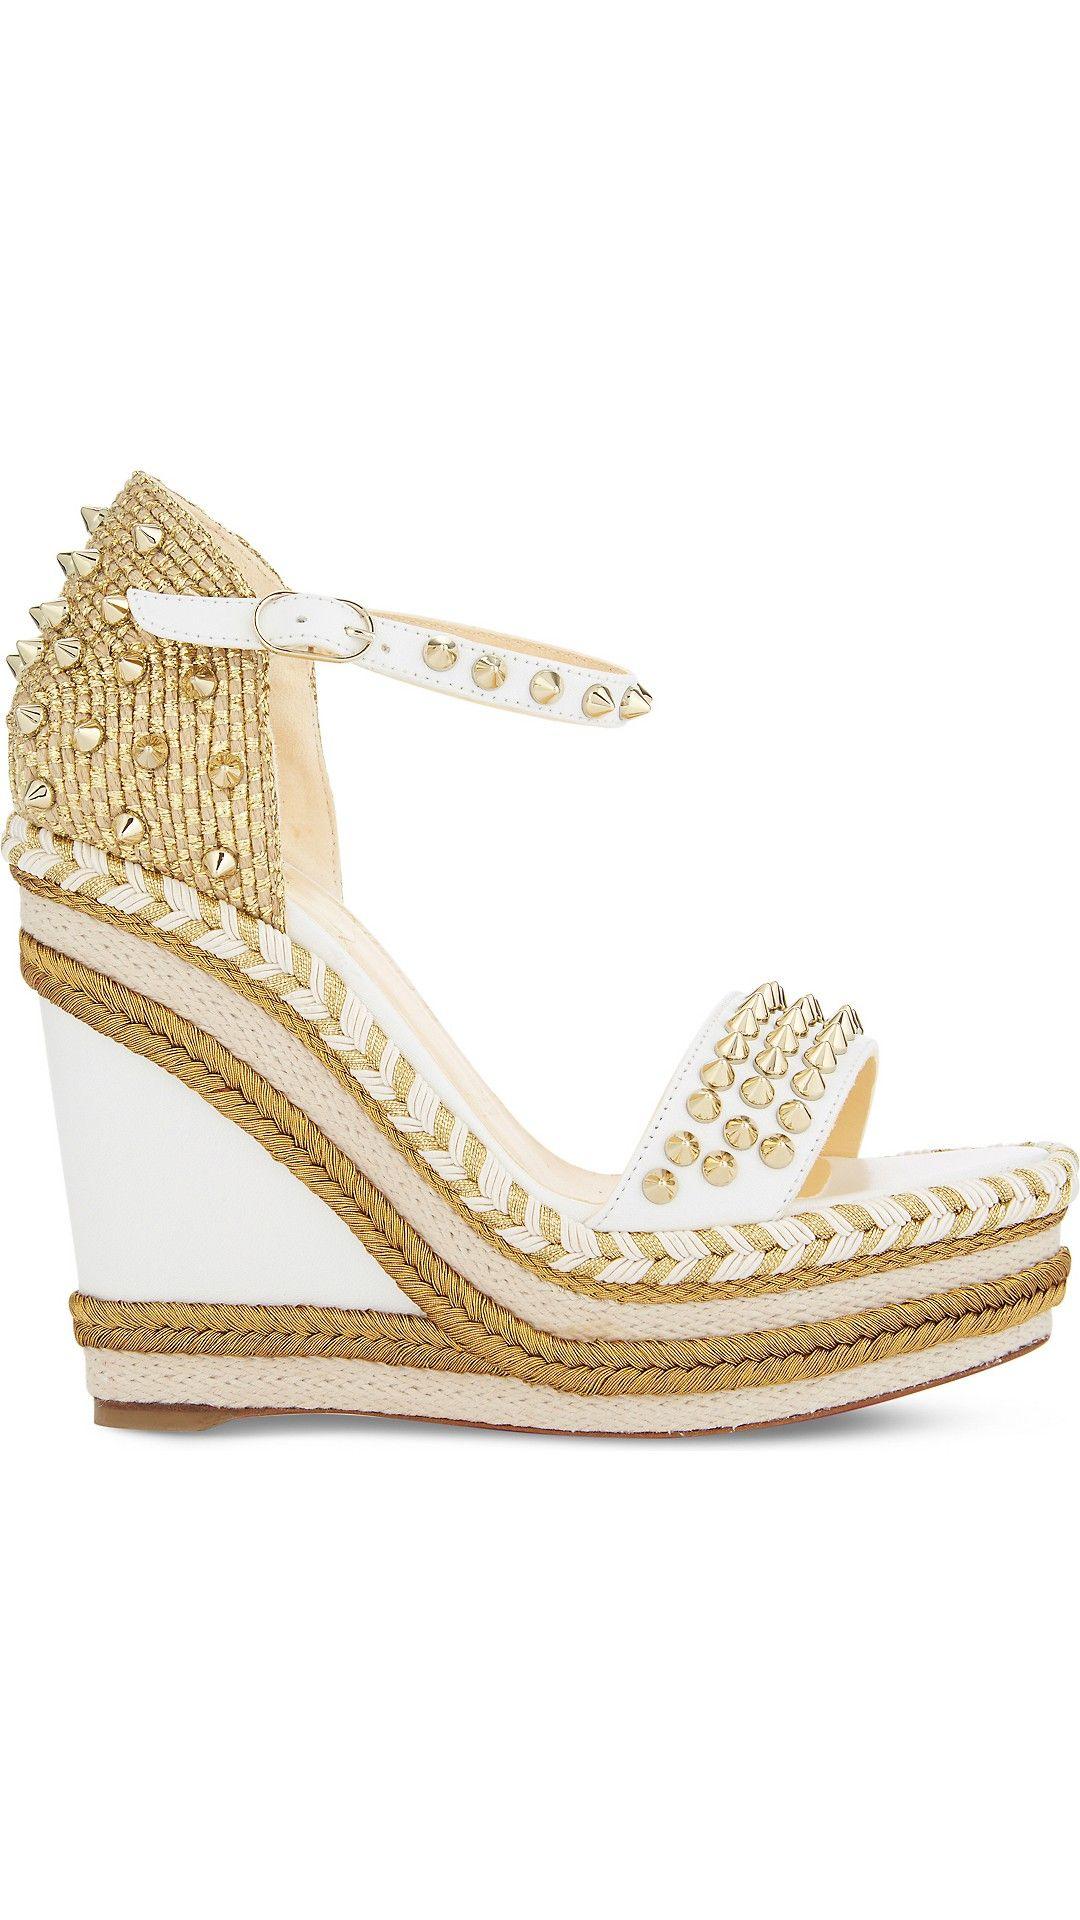 huge selection of 02887 24bfa Madmonica 120 nappa shiny | shoes | Shoes, Louboutin wedges ...